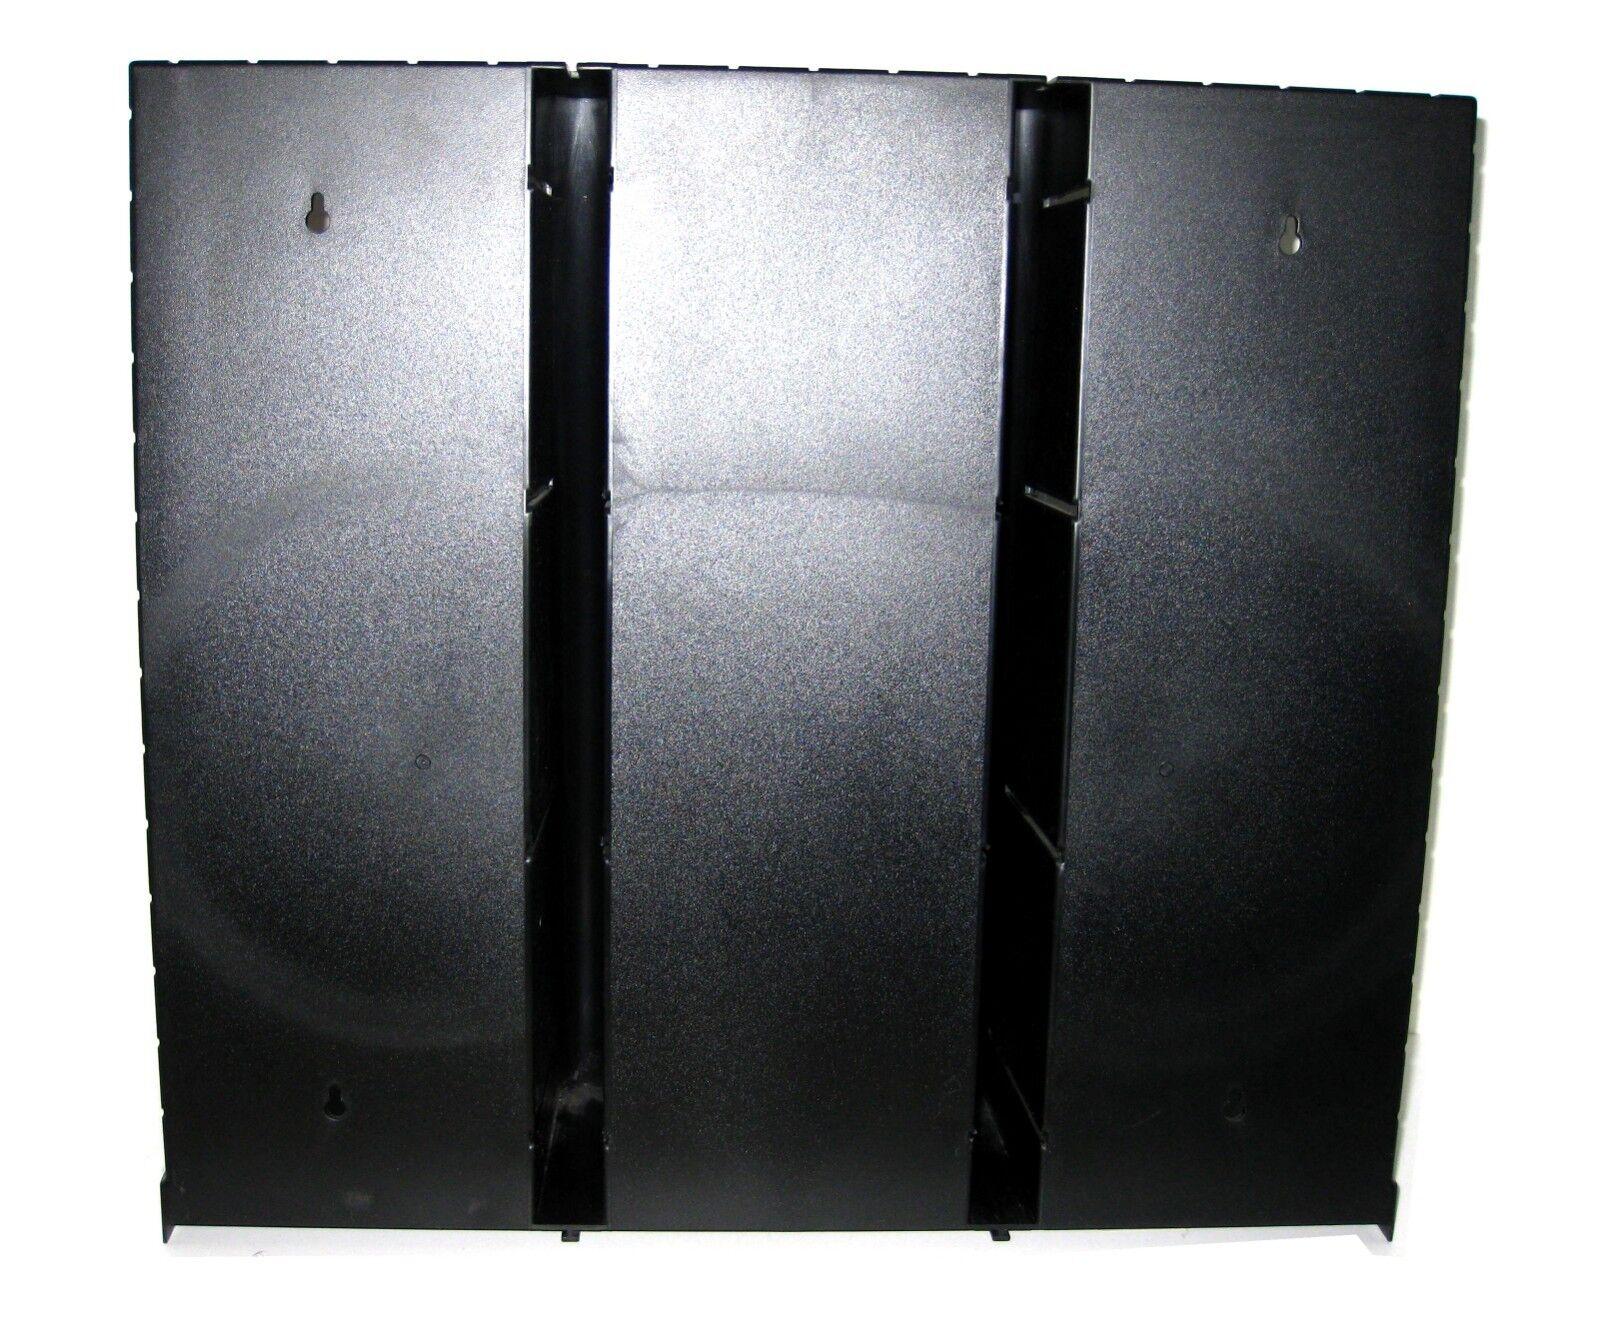 LASERLINE 36 CD STORAGE RACK HOLDER WITH DOOR BOX WALL MOUNT DESK TOP ORGANIZER